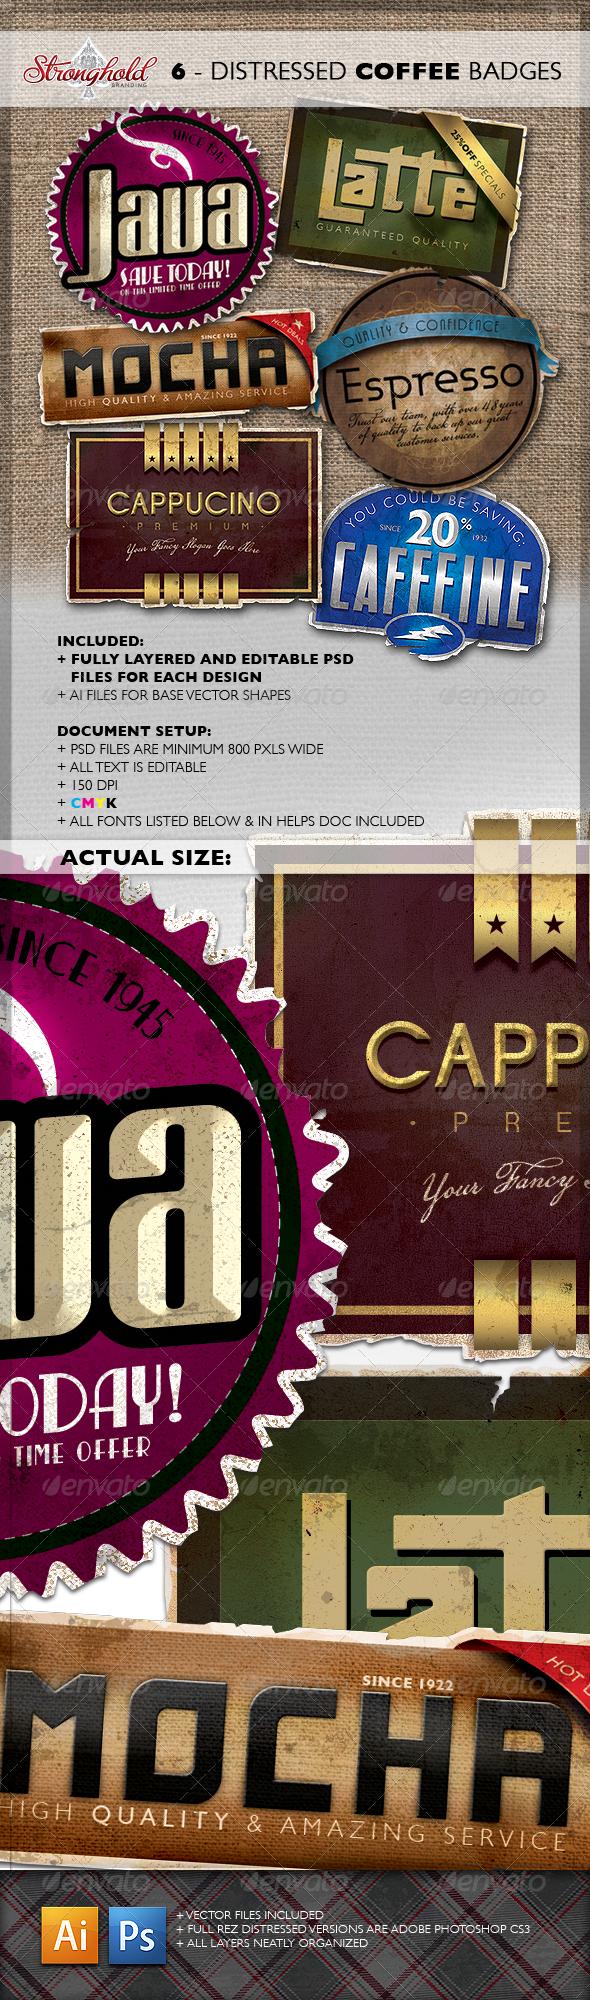 Vintage Distressed Coffee Badges - Badges & Stickers Web Elements